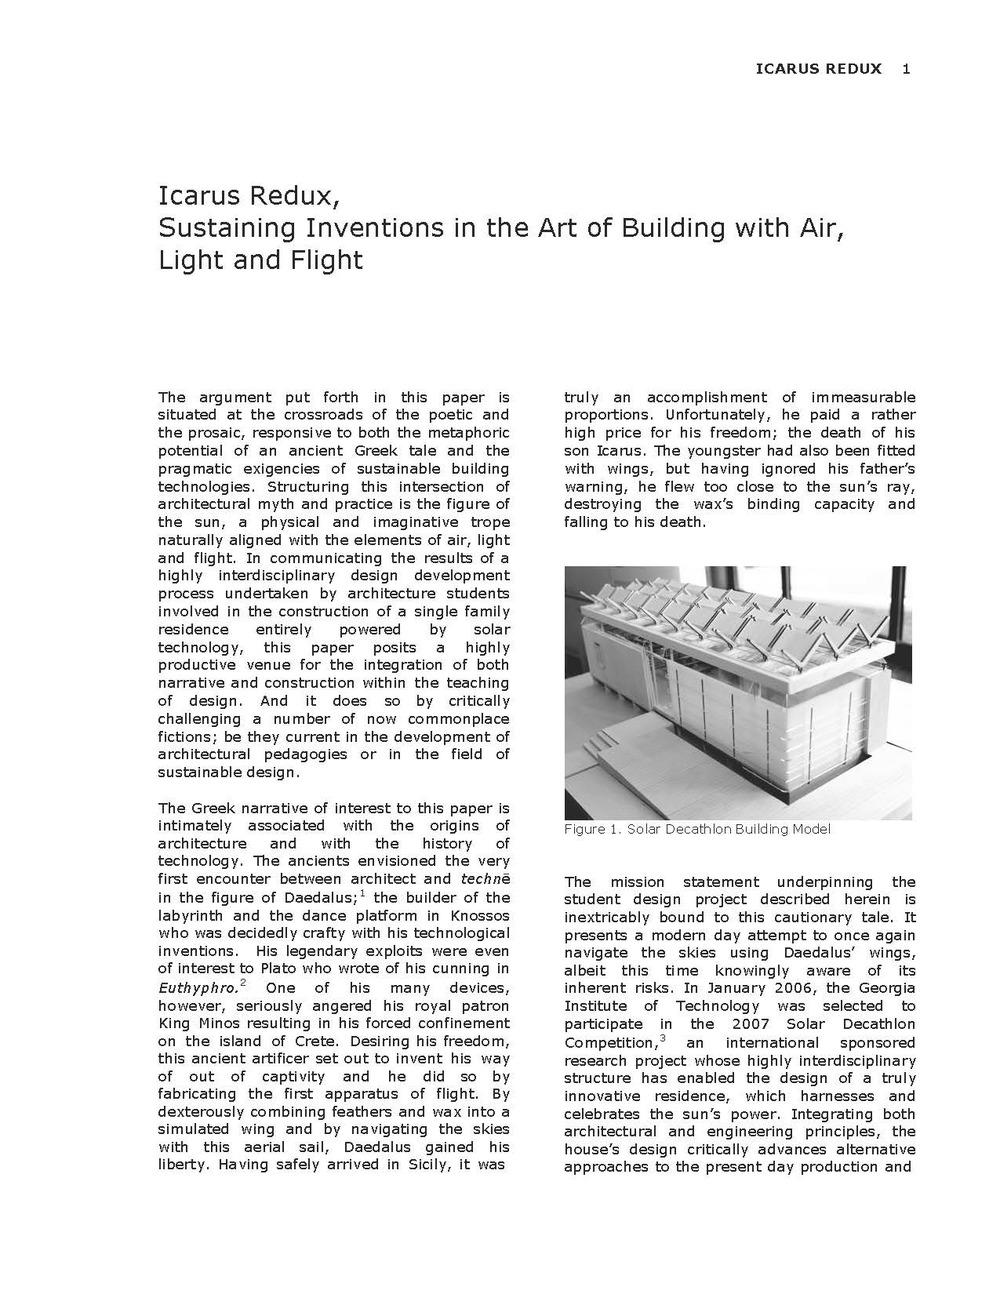 ACSA.2007.IcarusRedux2_Page_1.jpg